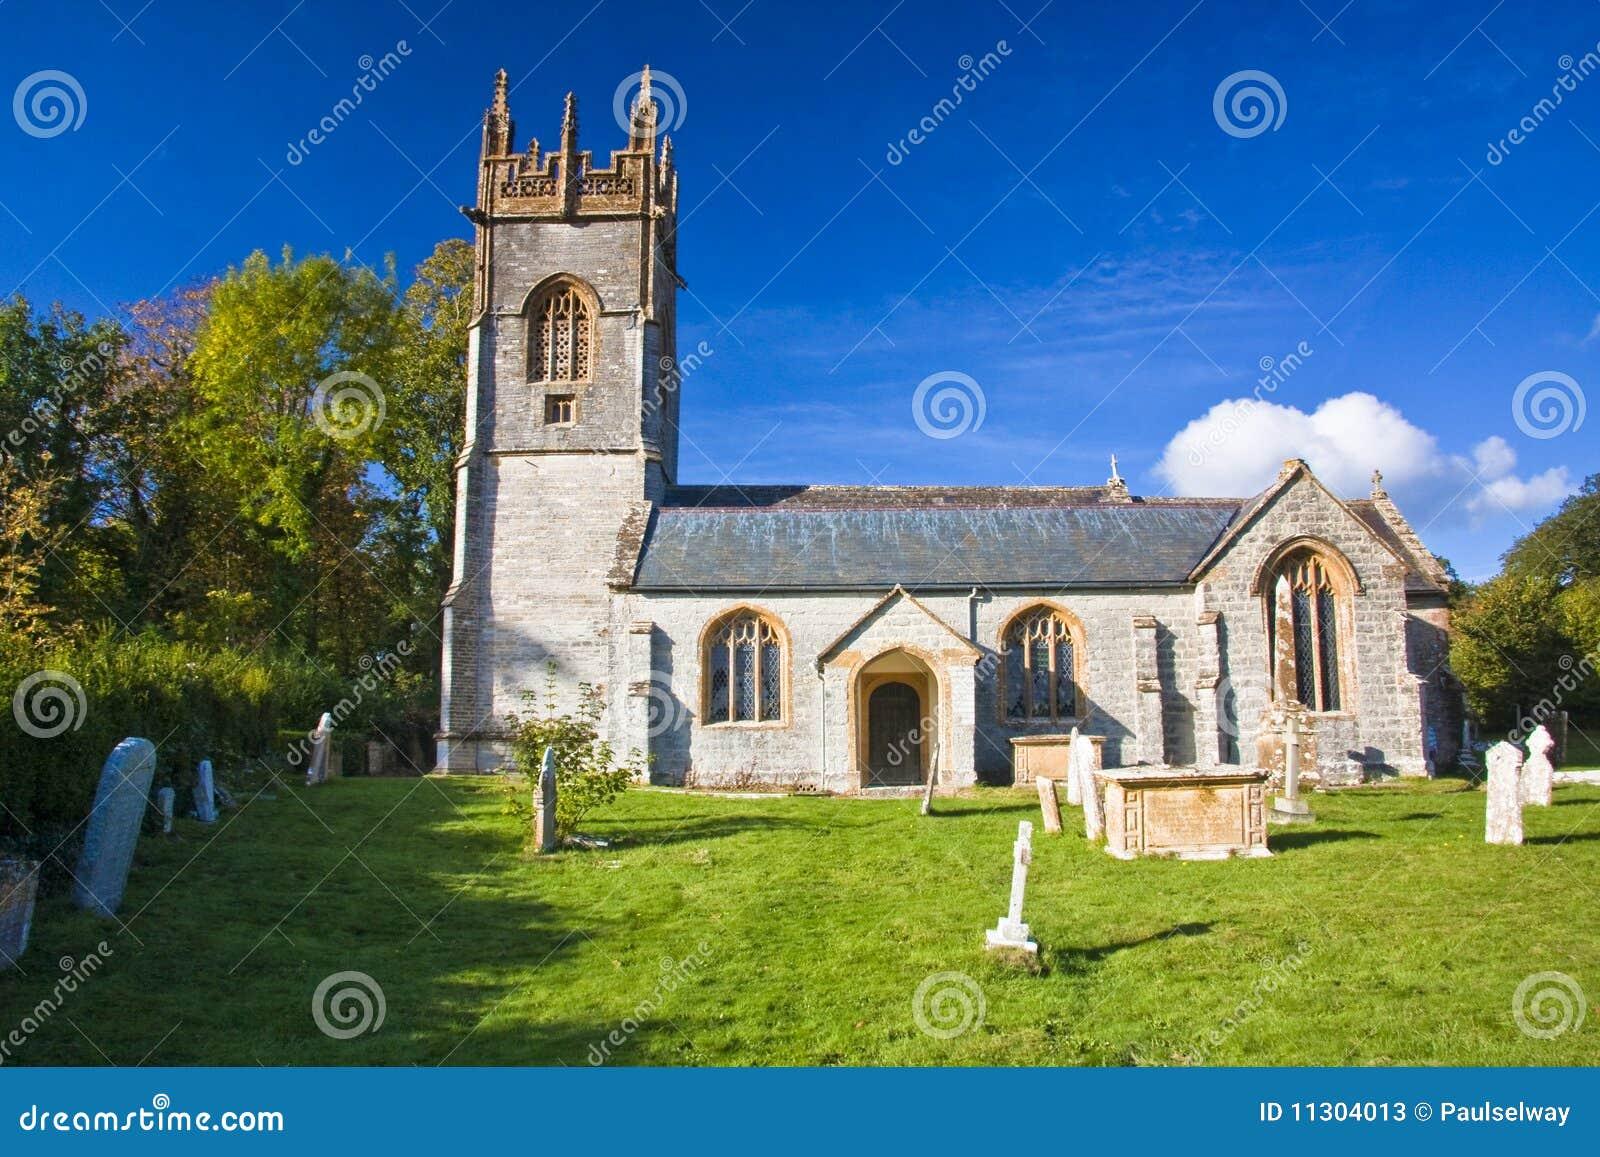 Landschaft der kleinen Kirche